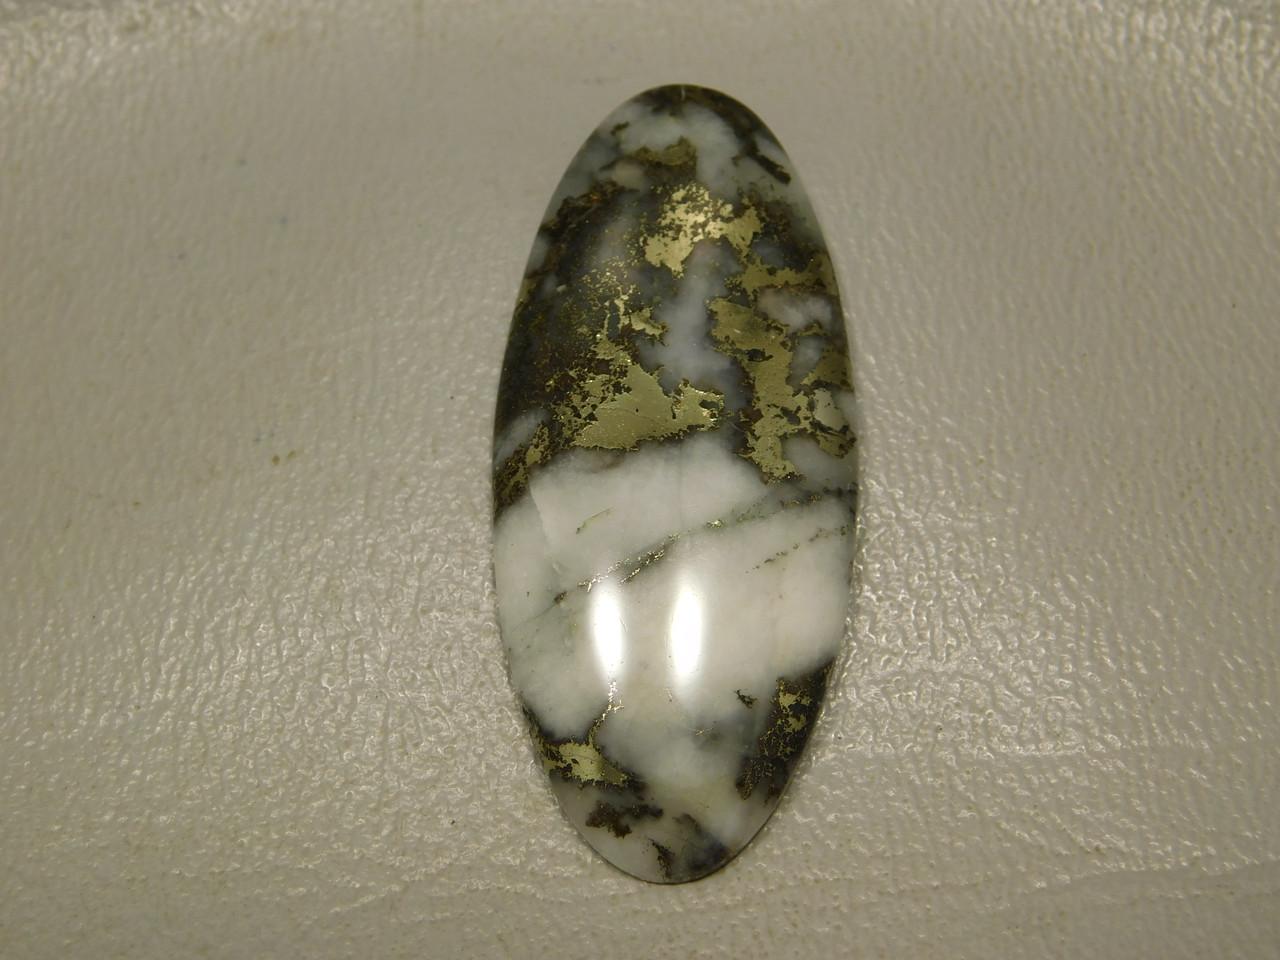 Cabochons Mohawkite Stone Metallic Gold in White Gemstone  #19